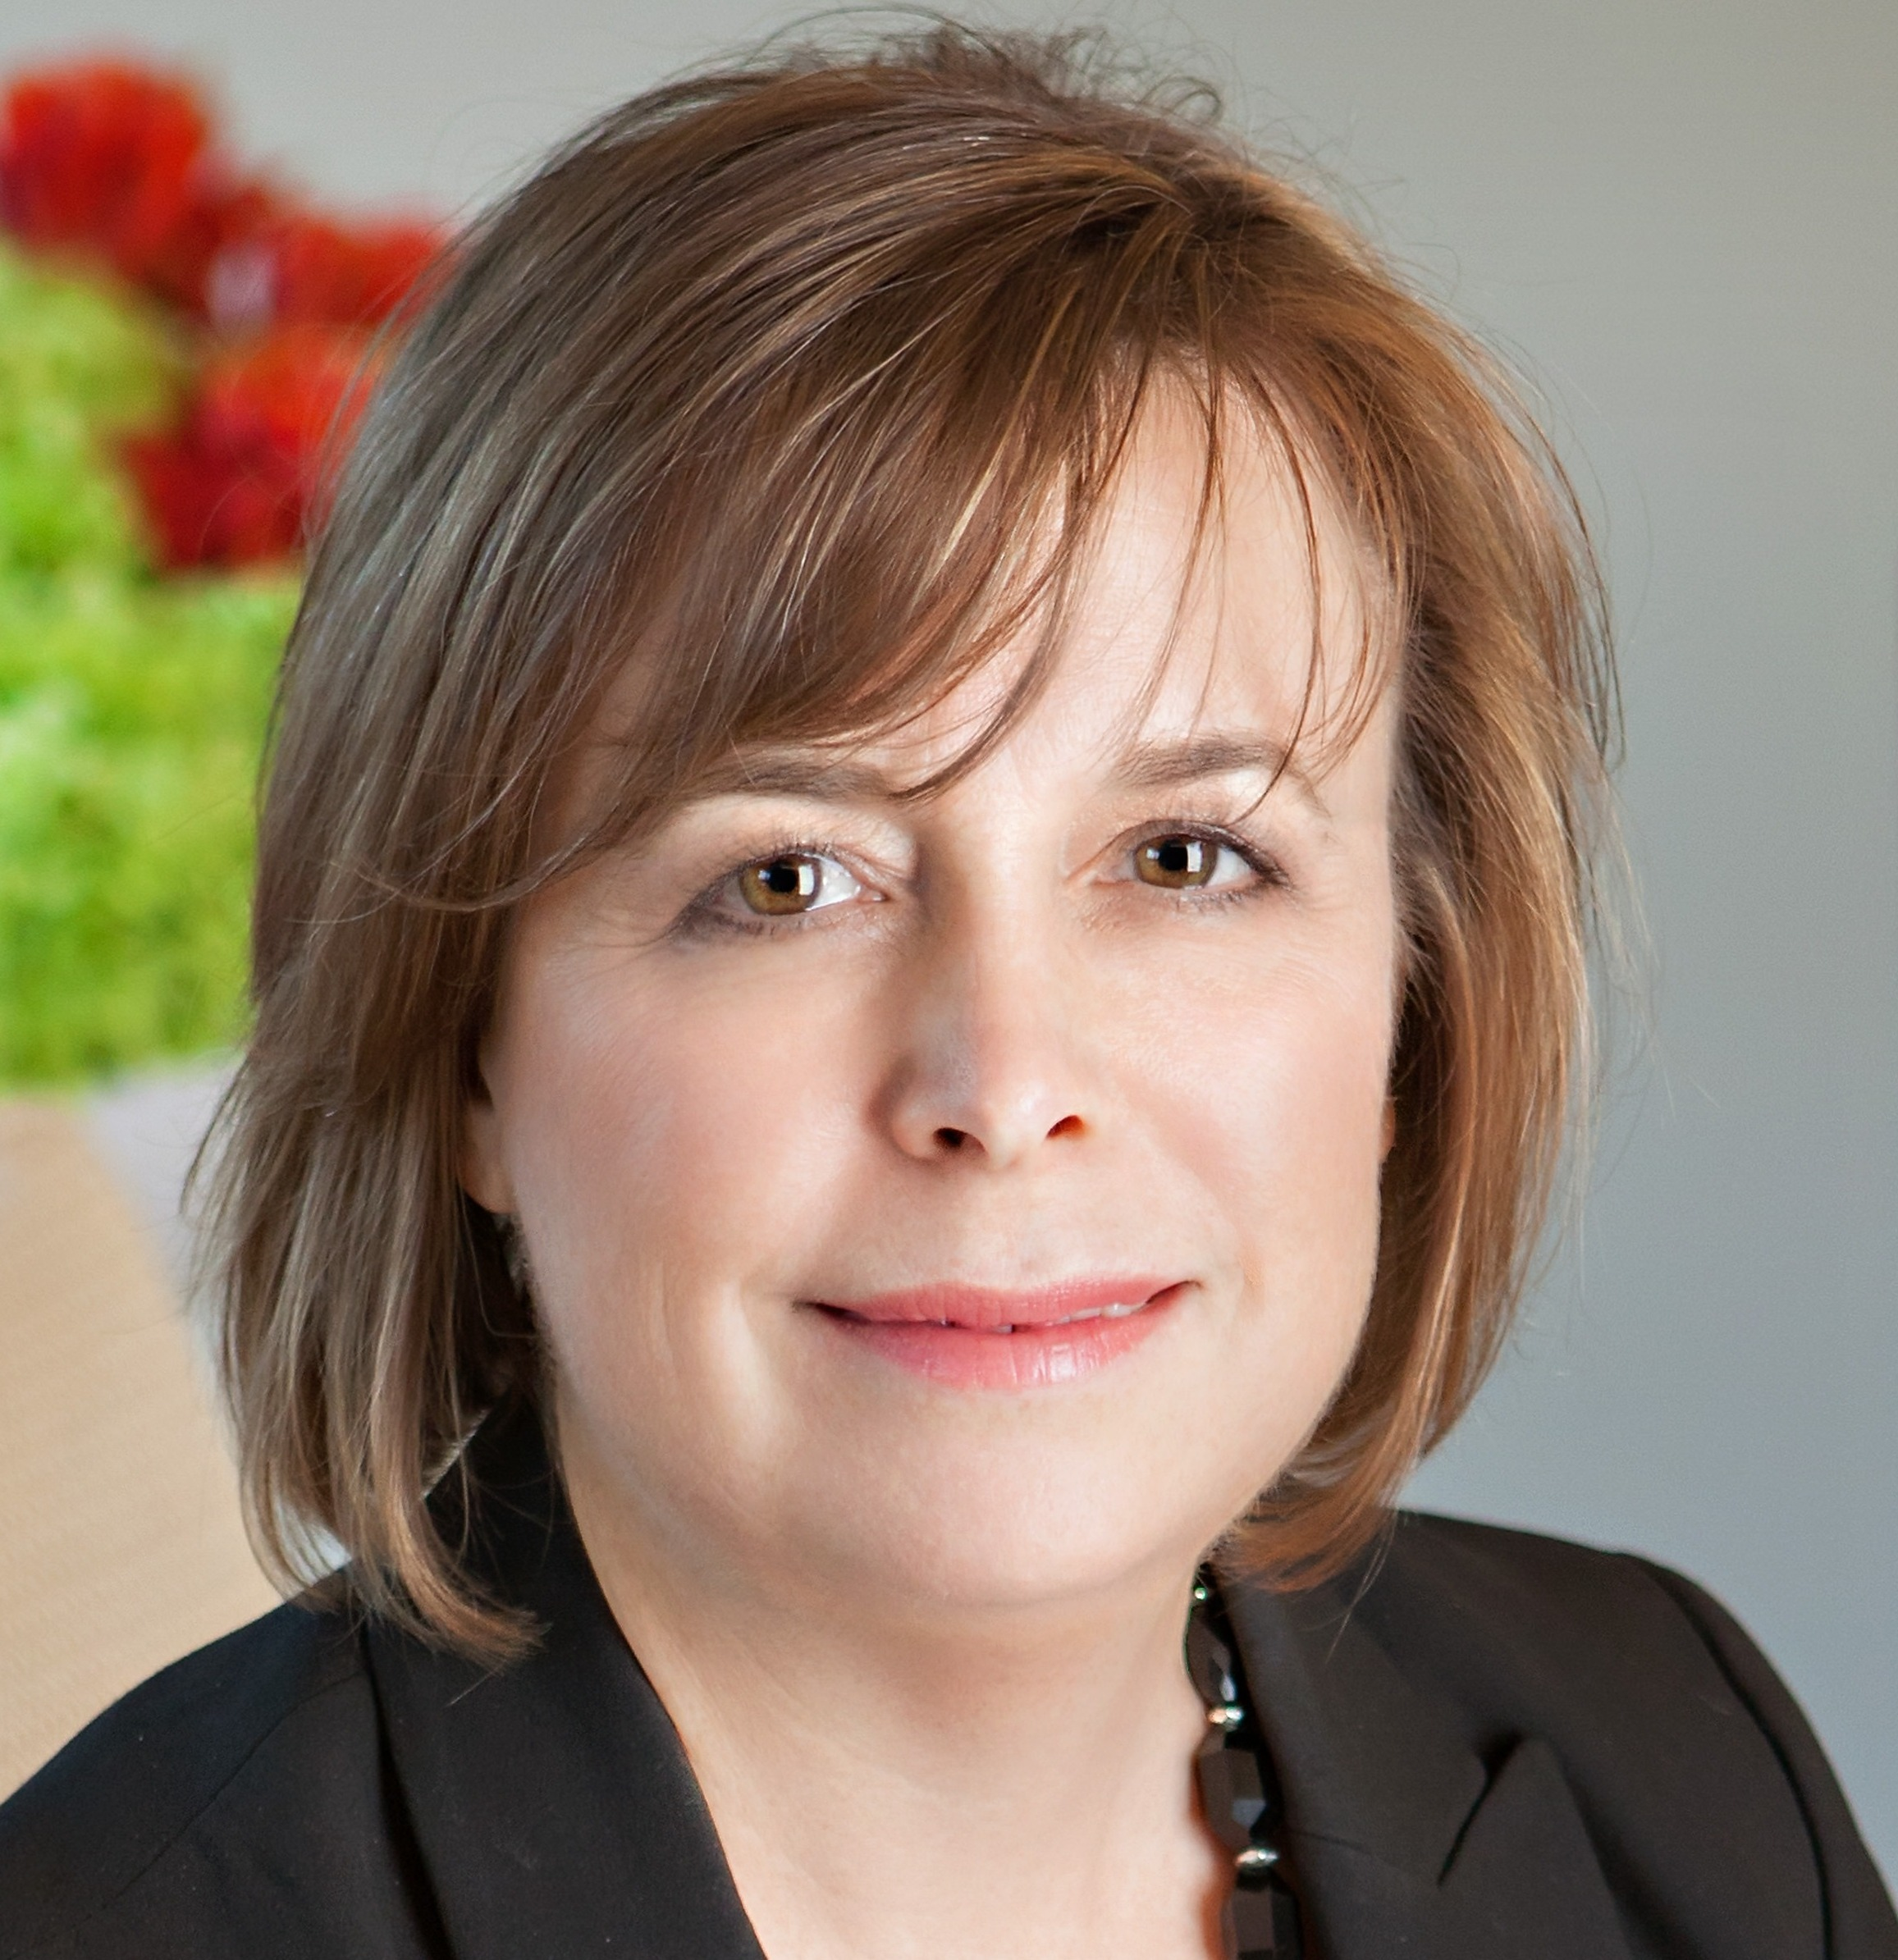 Dr Jill Studley